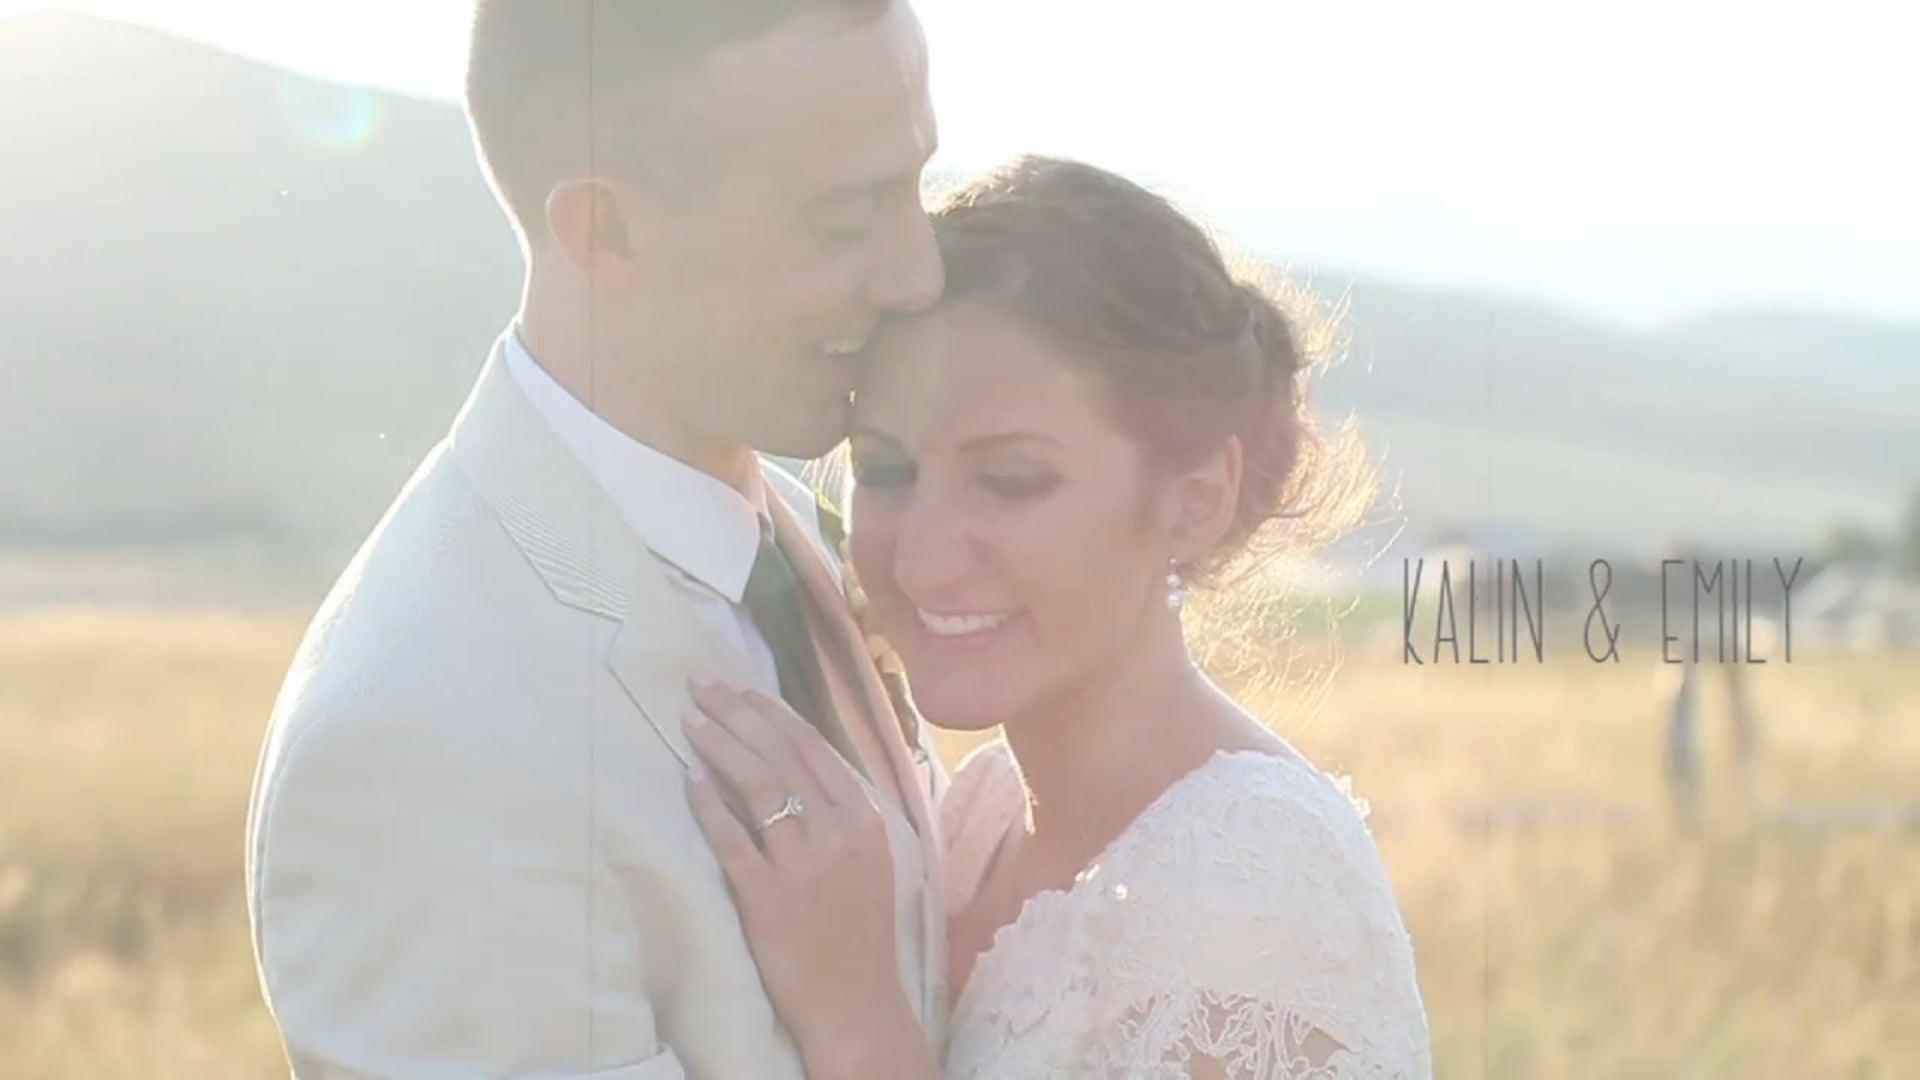 Kalin & Emily Wedding film